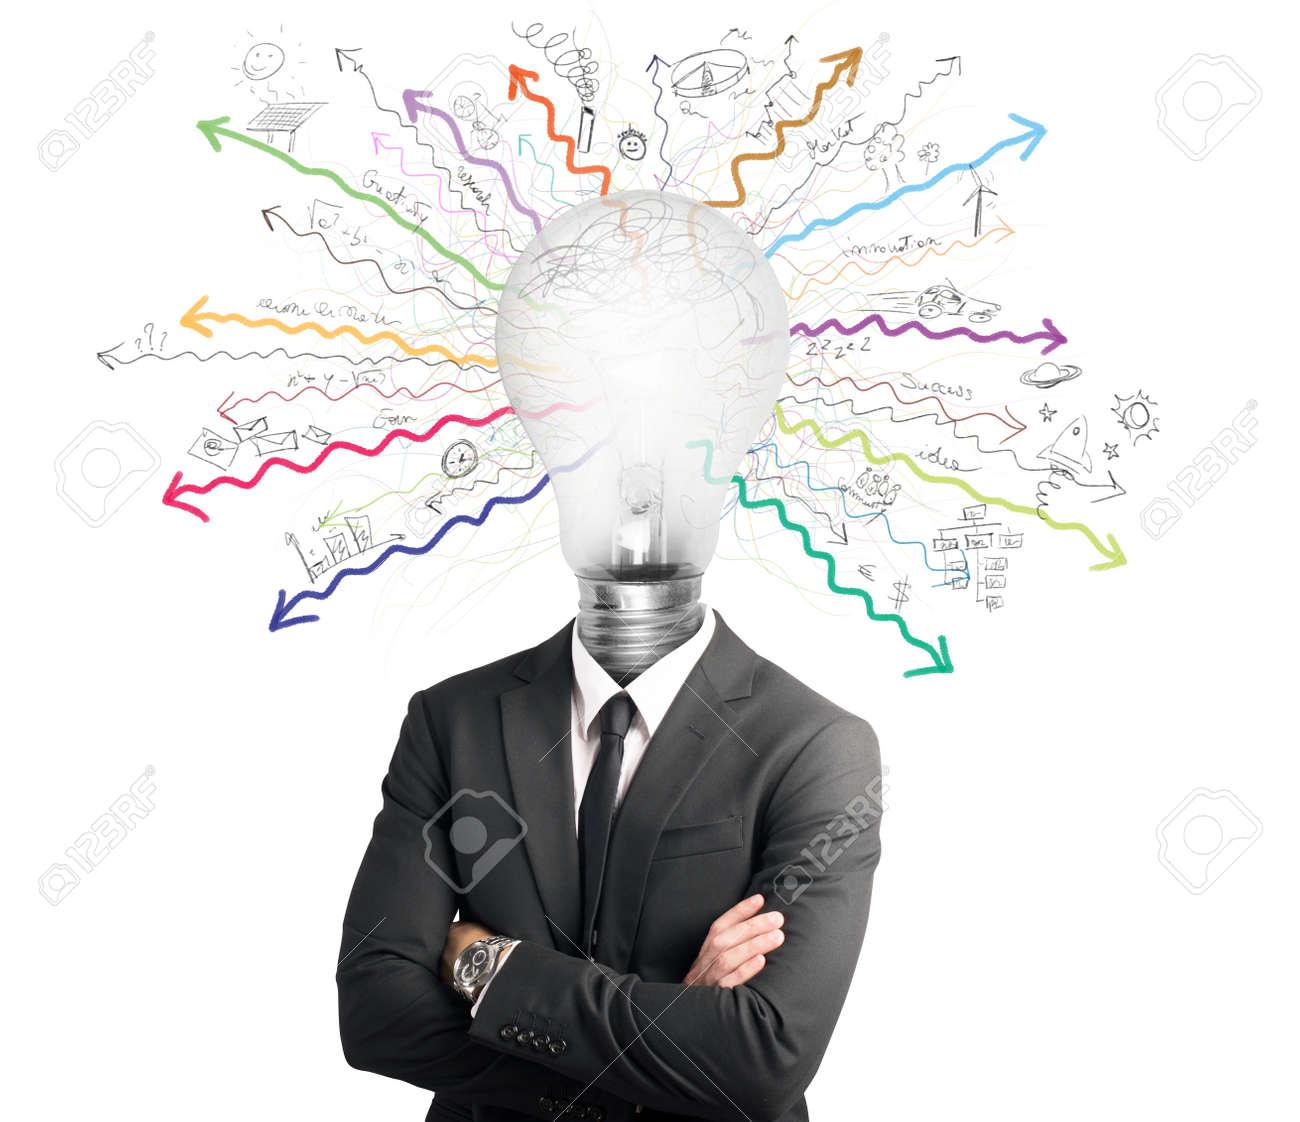 Concept of genius with illuminated light bulb in head Stock Photo - 24971672